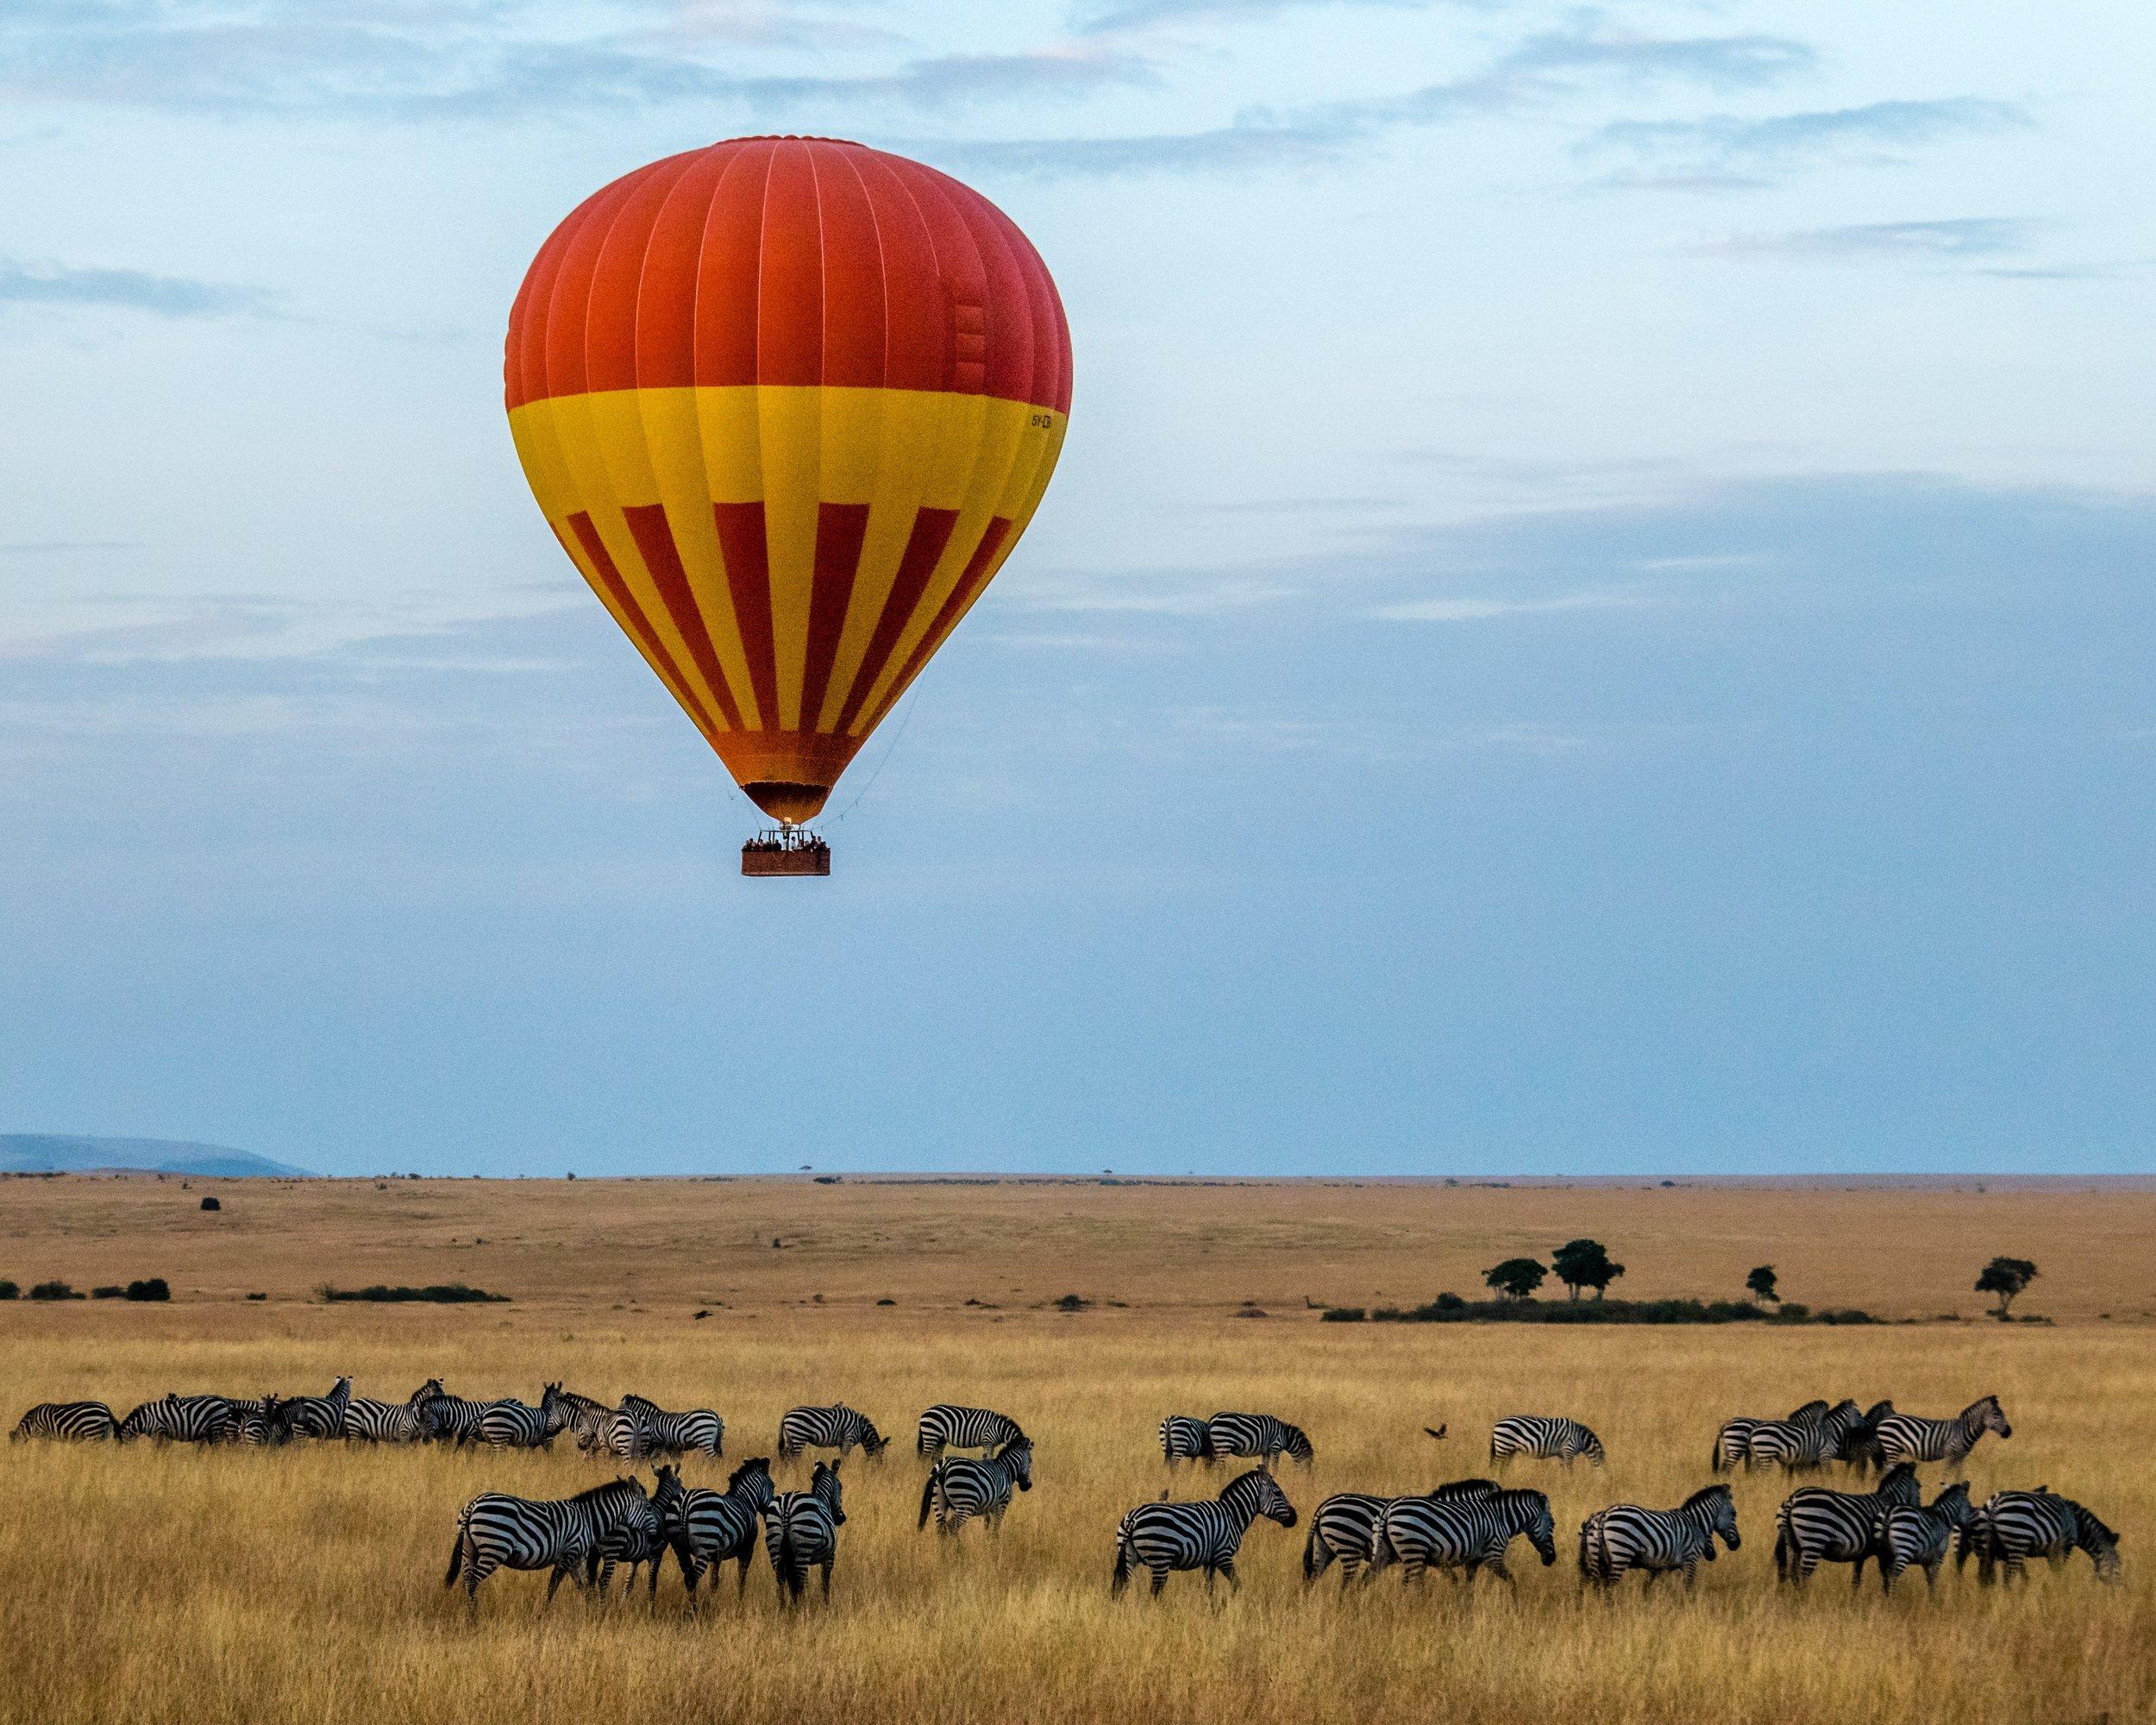 Maasai Mara National Reserve, Narok County, Kenya. Photo by  sutirta budiman  on  Unsplash